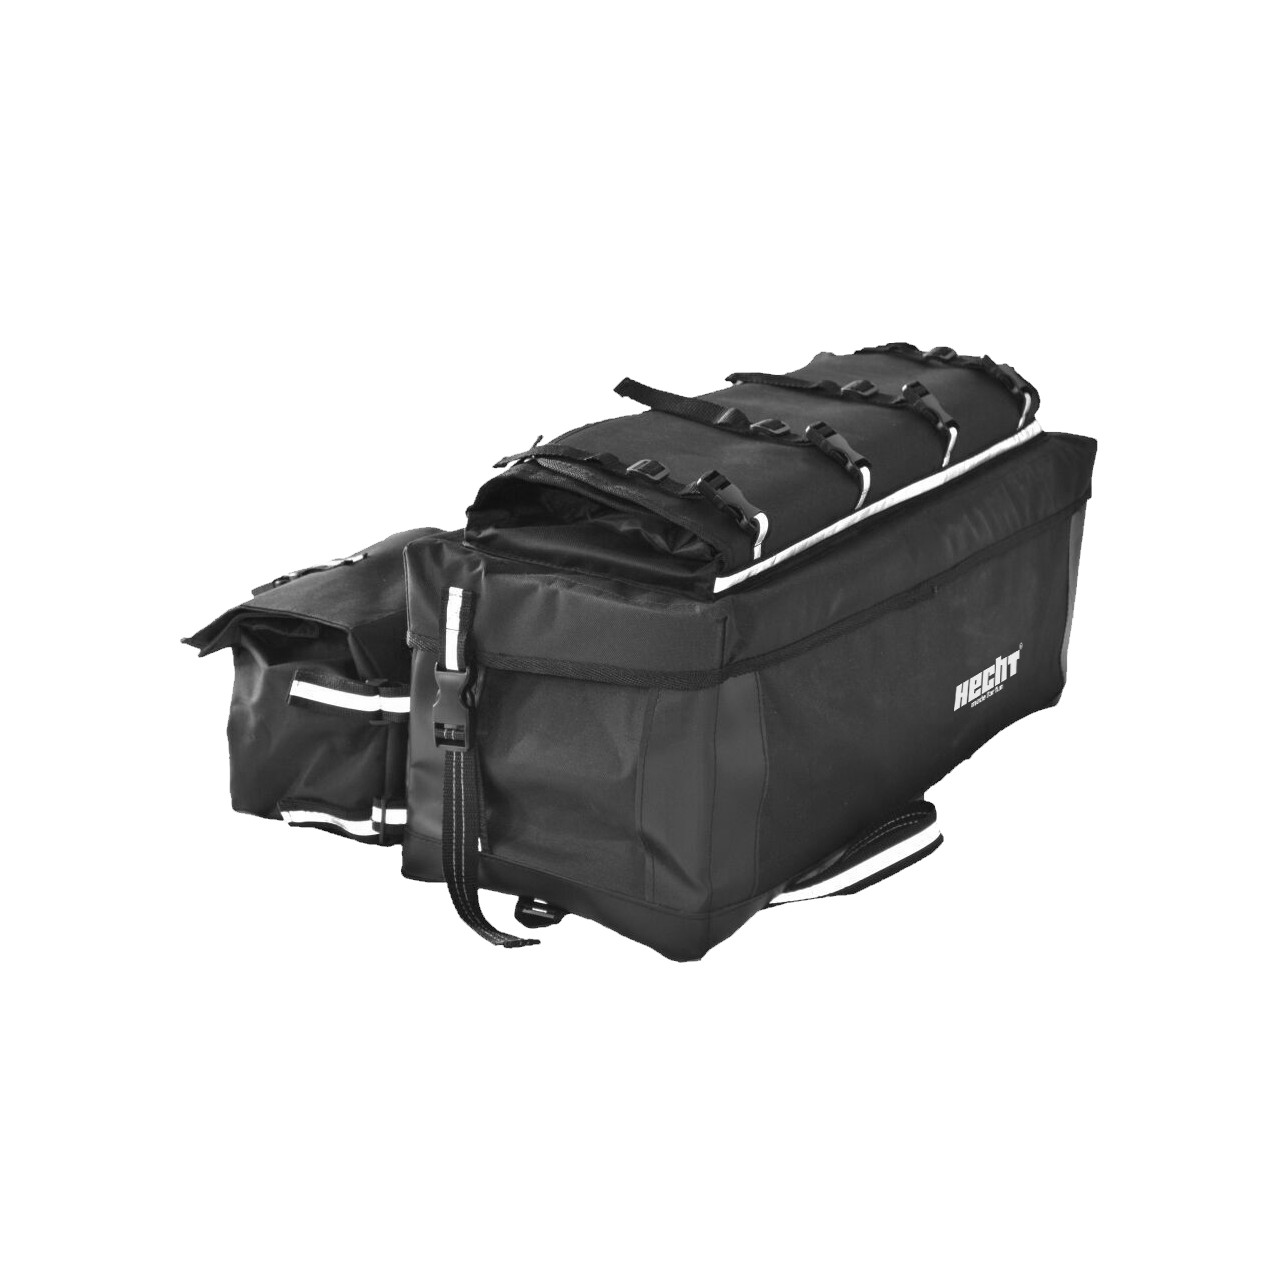 HECHT 52002 BLACK - ATV brašna